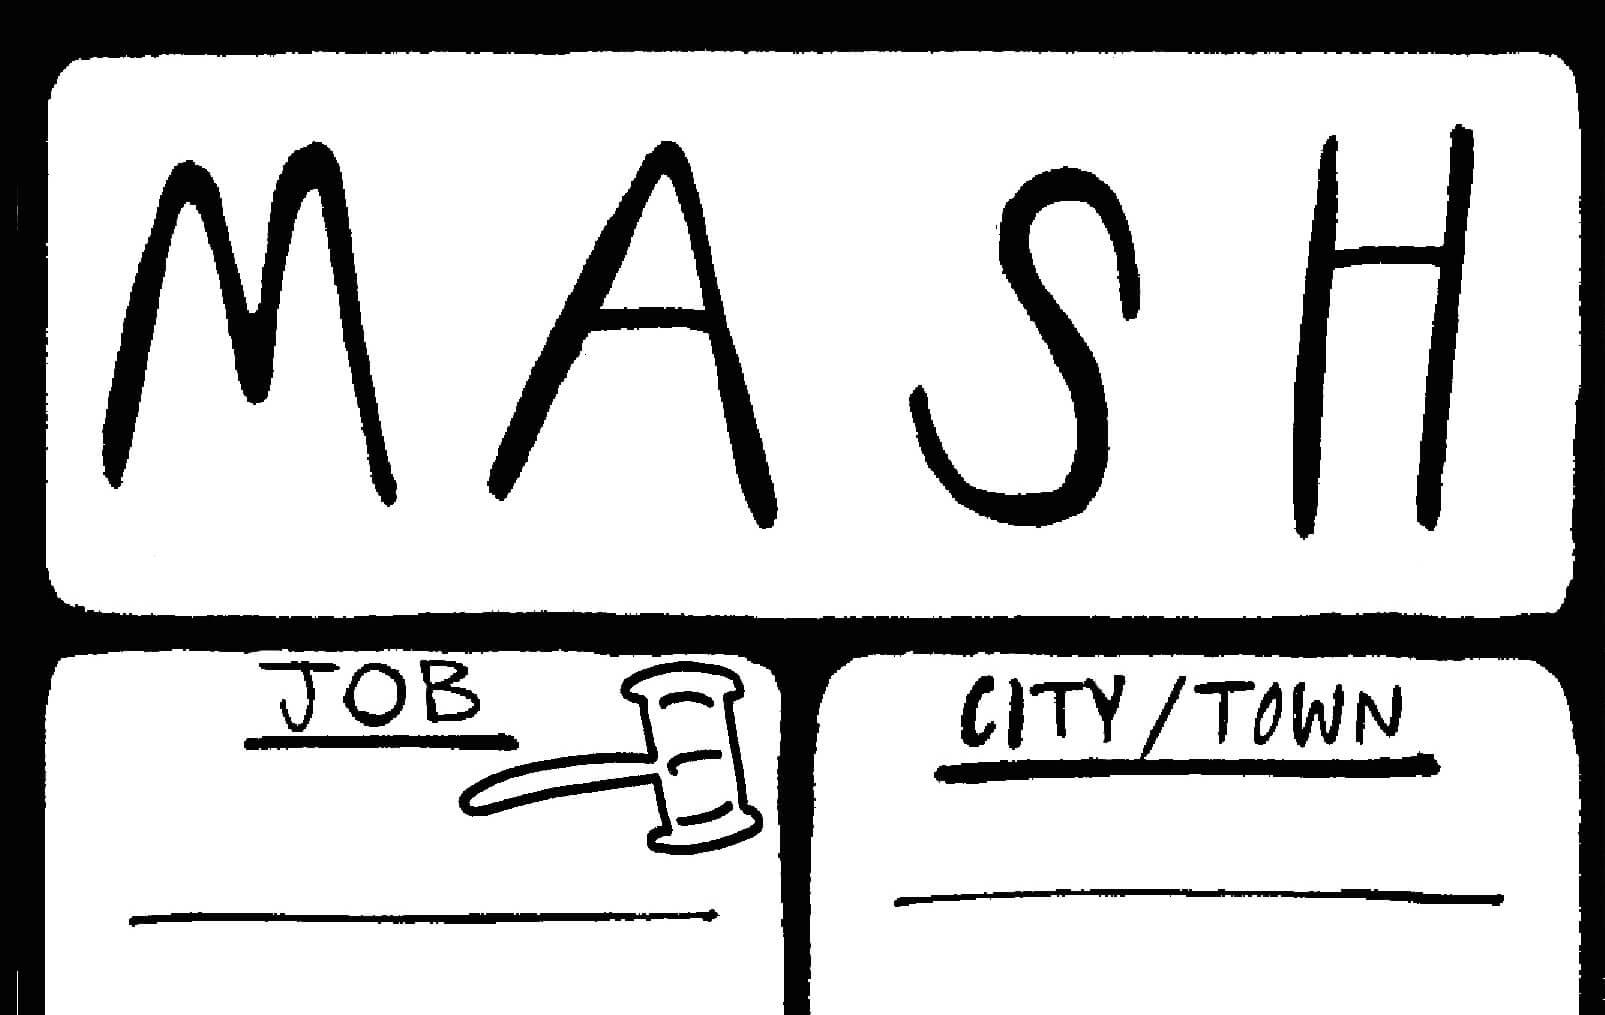 Rookie Printable Mash Game